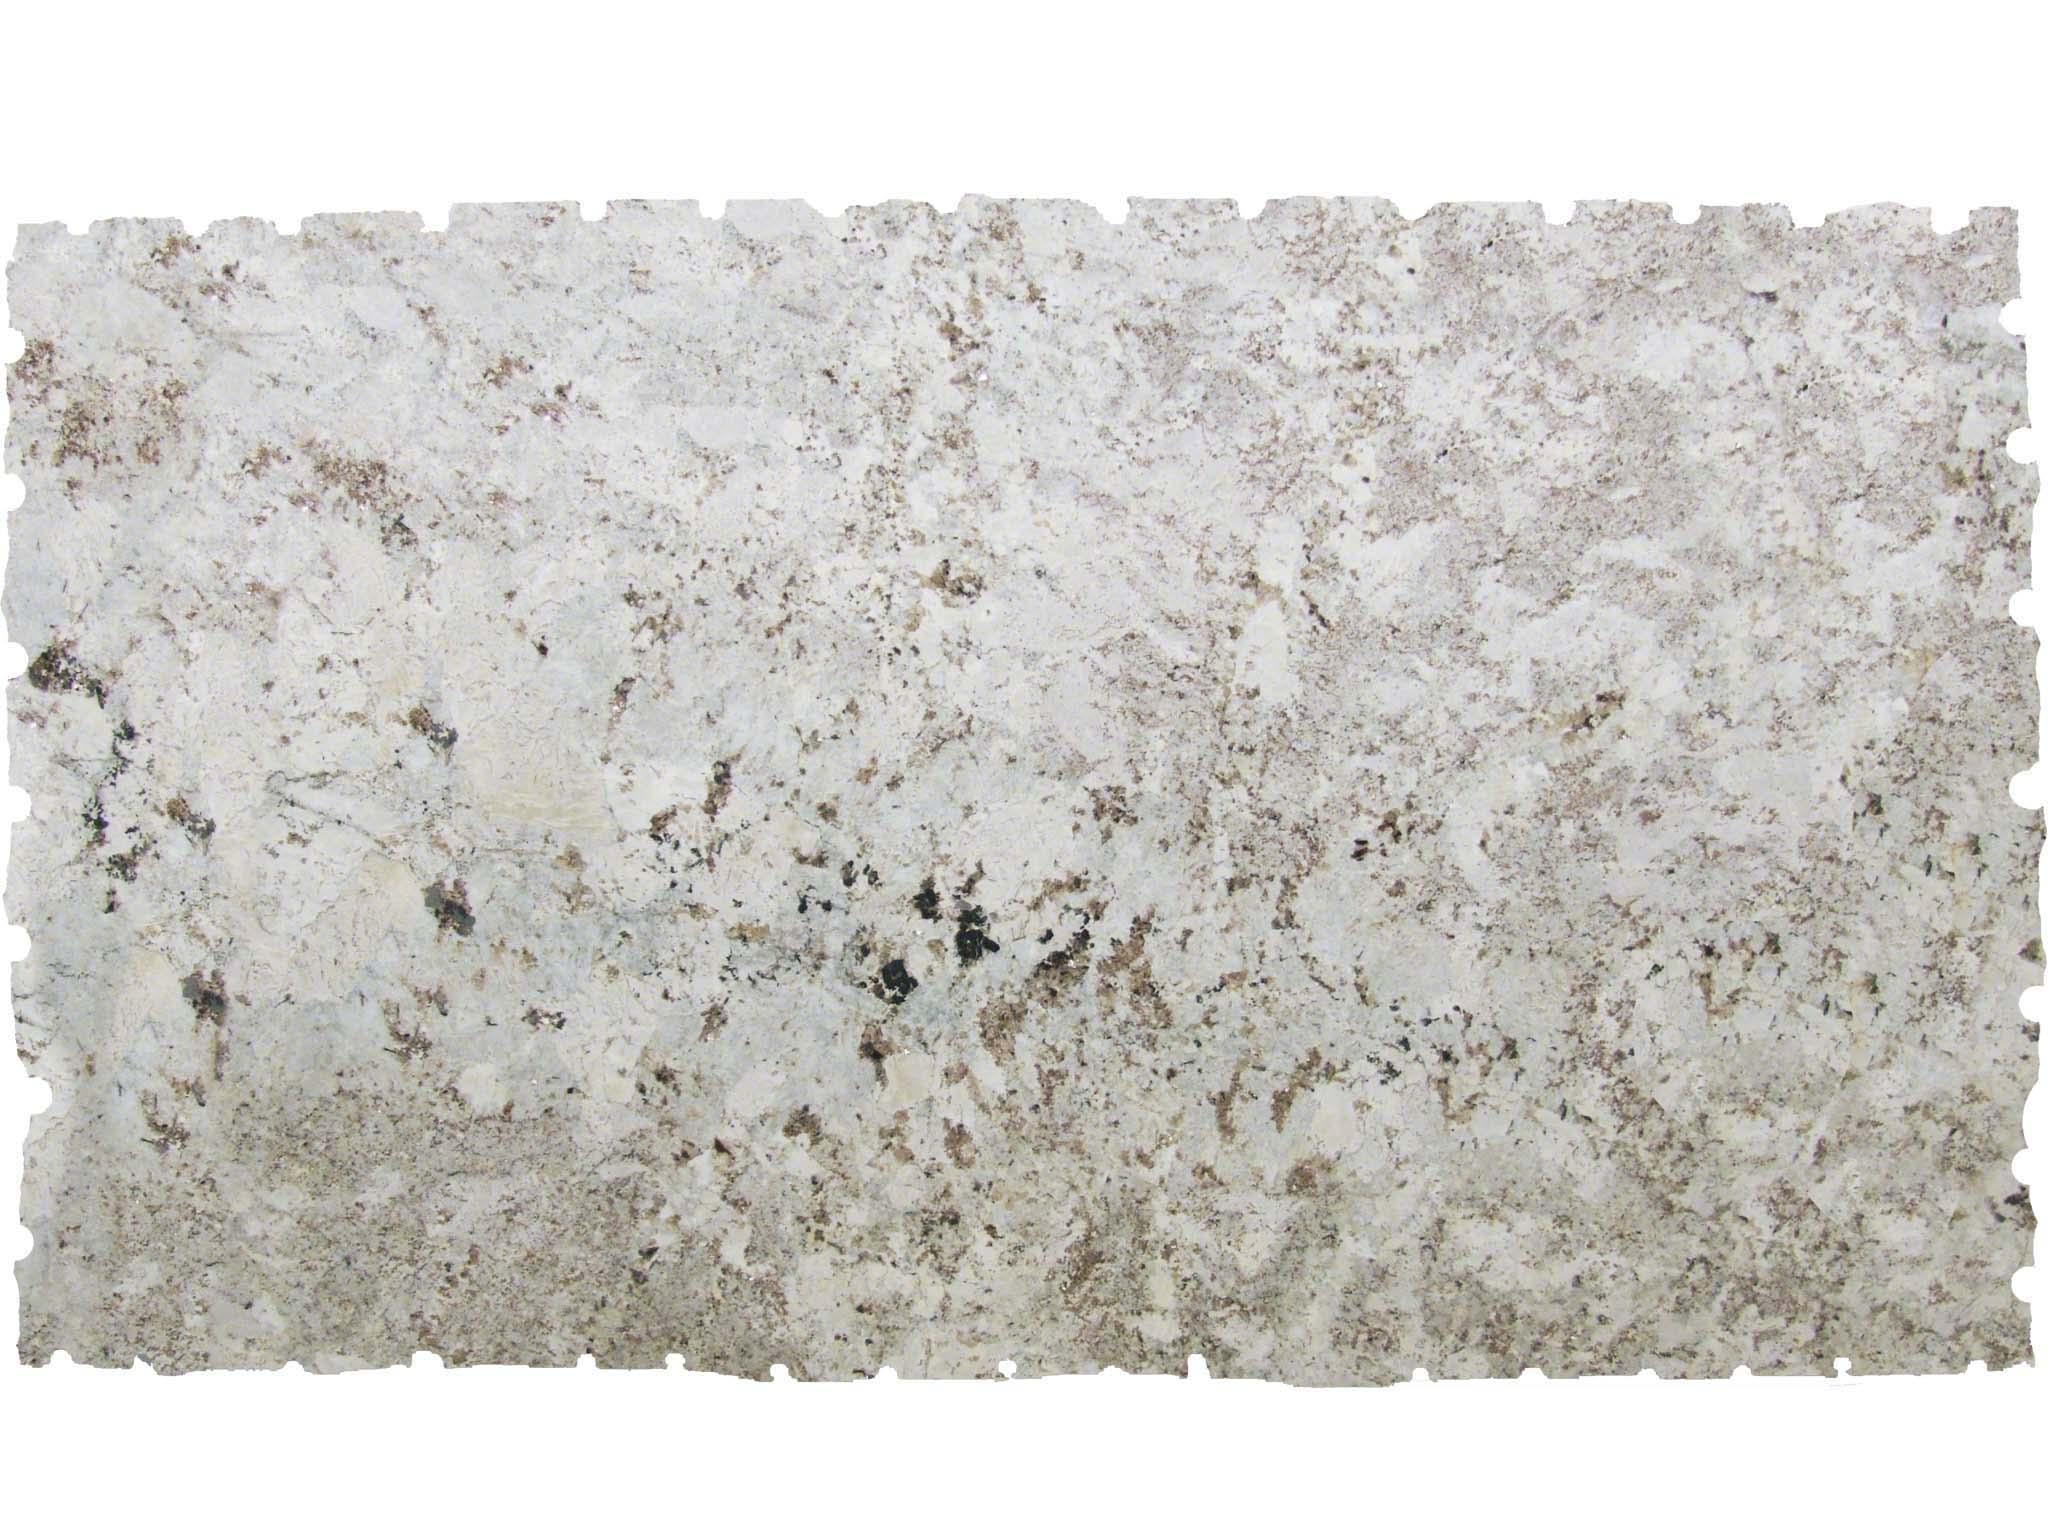 Alaska White Granite Accent Countertops